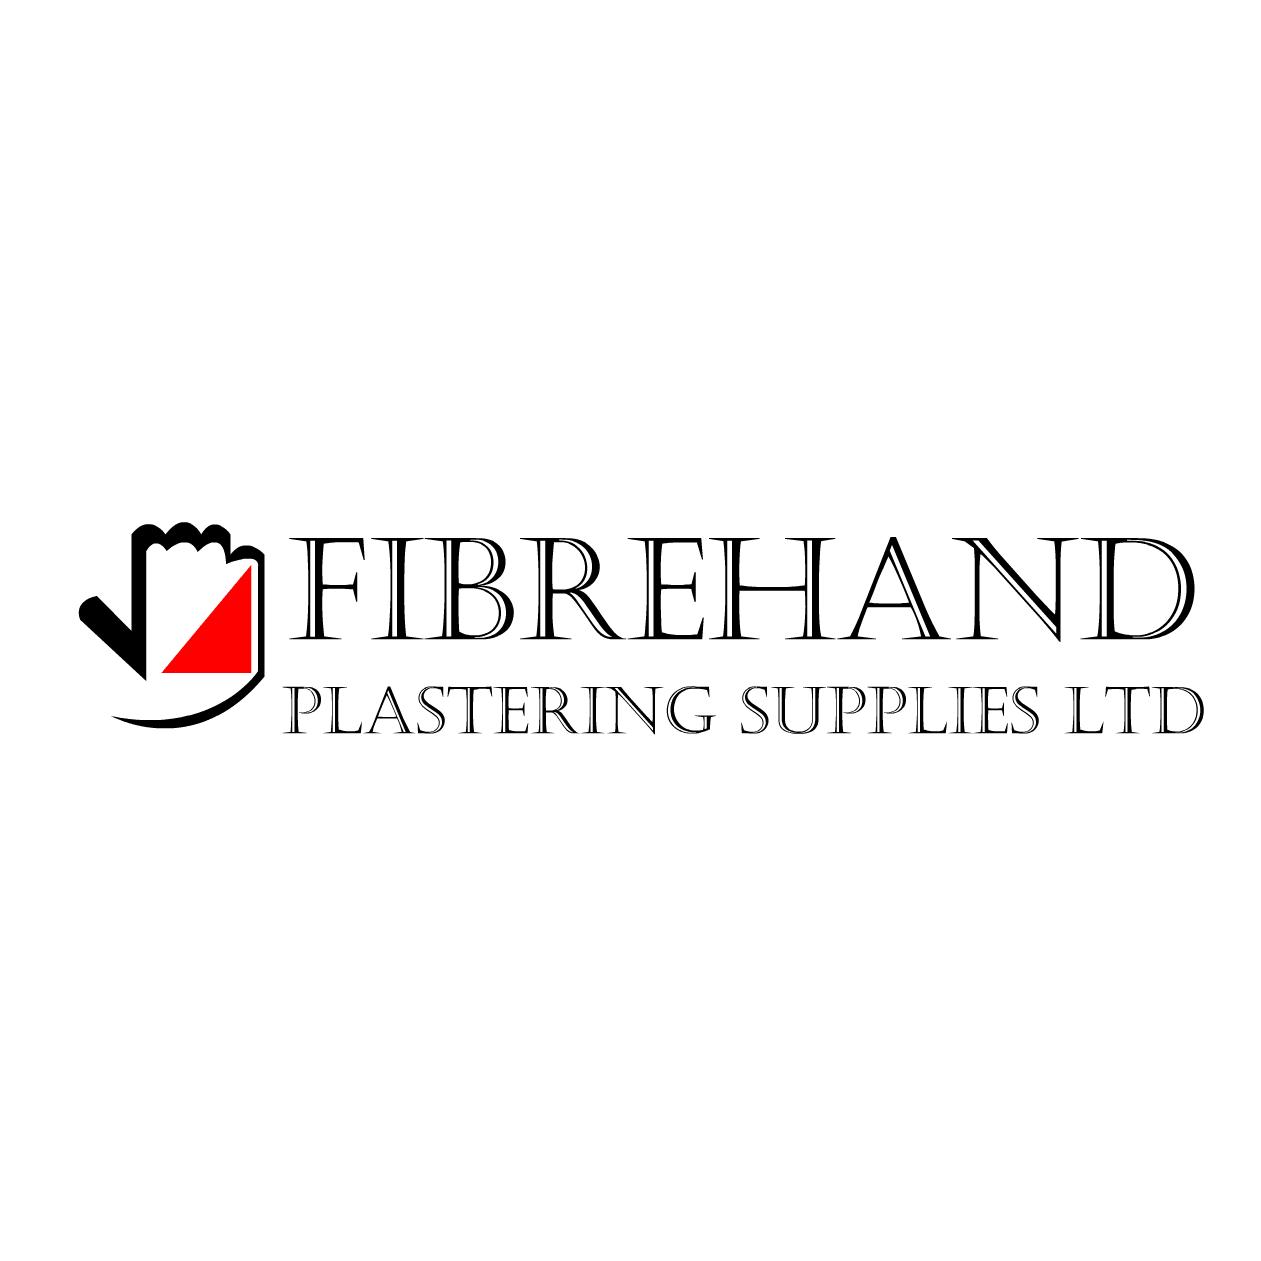 fibrehand plastering supplies ltd hockley opening times. Black Bedroom Furniture Sets. Home Design Ideas